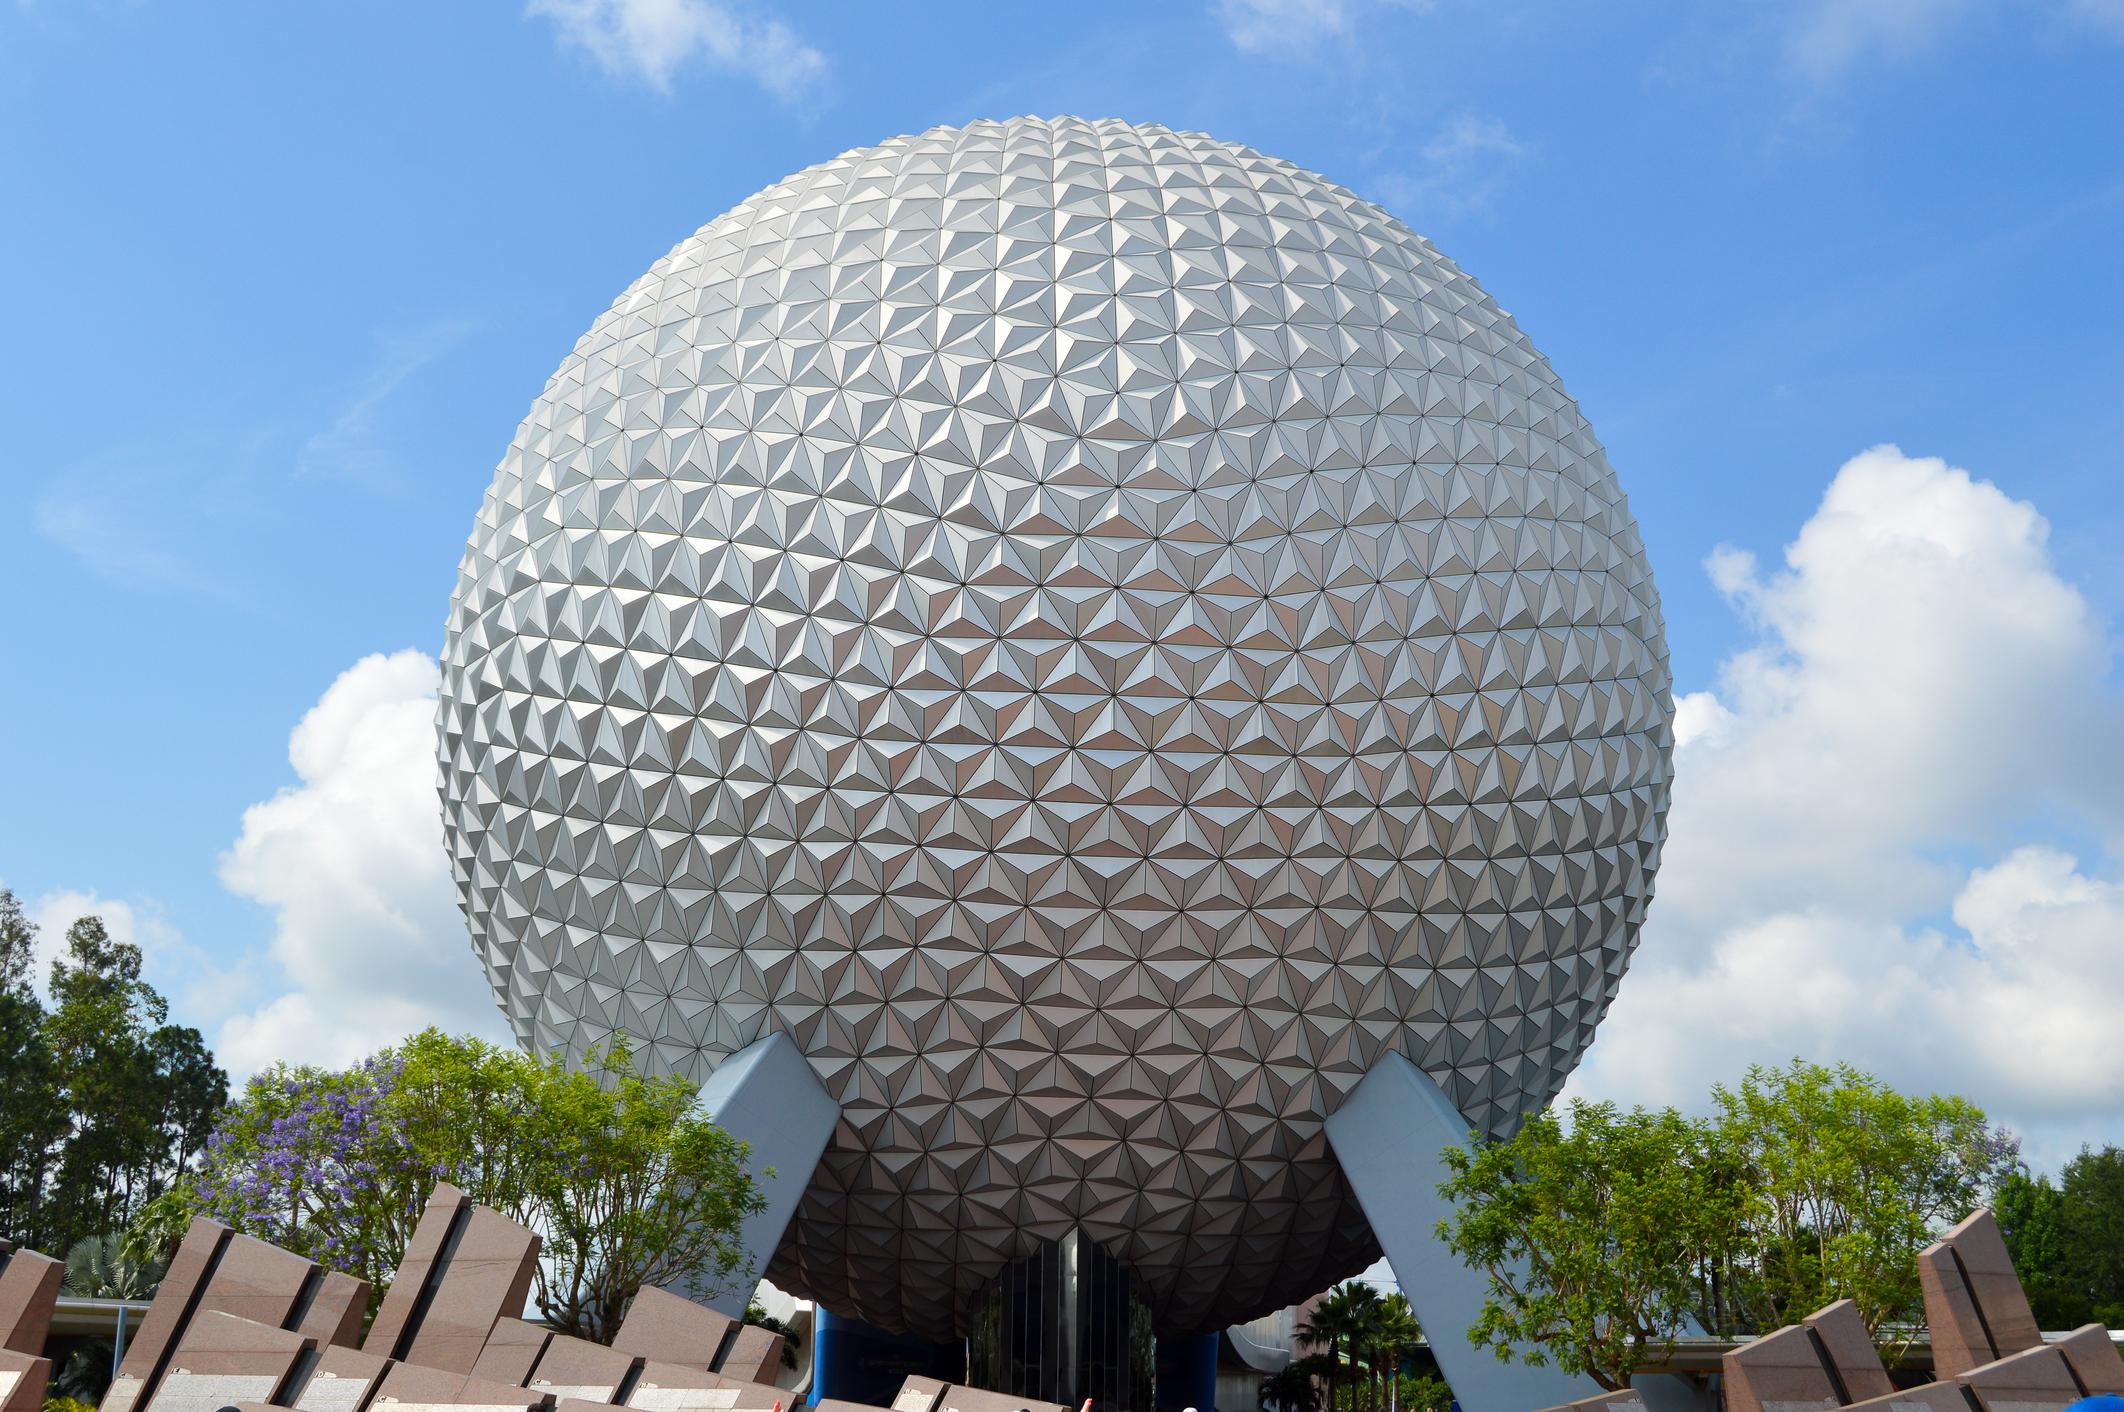 Image of Epcot Center at Disney World.